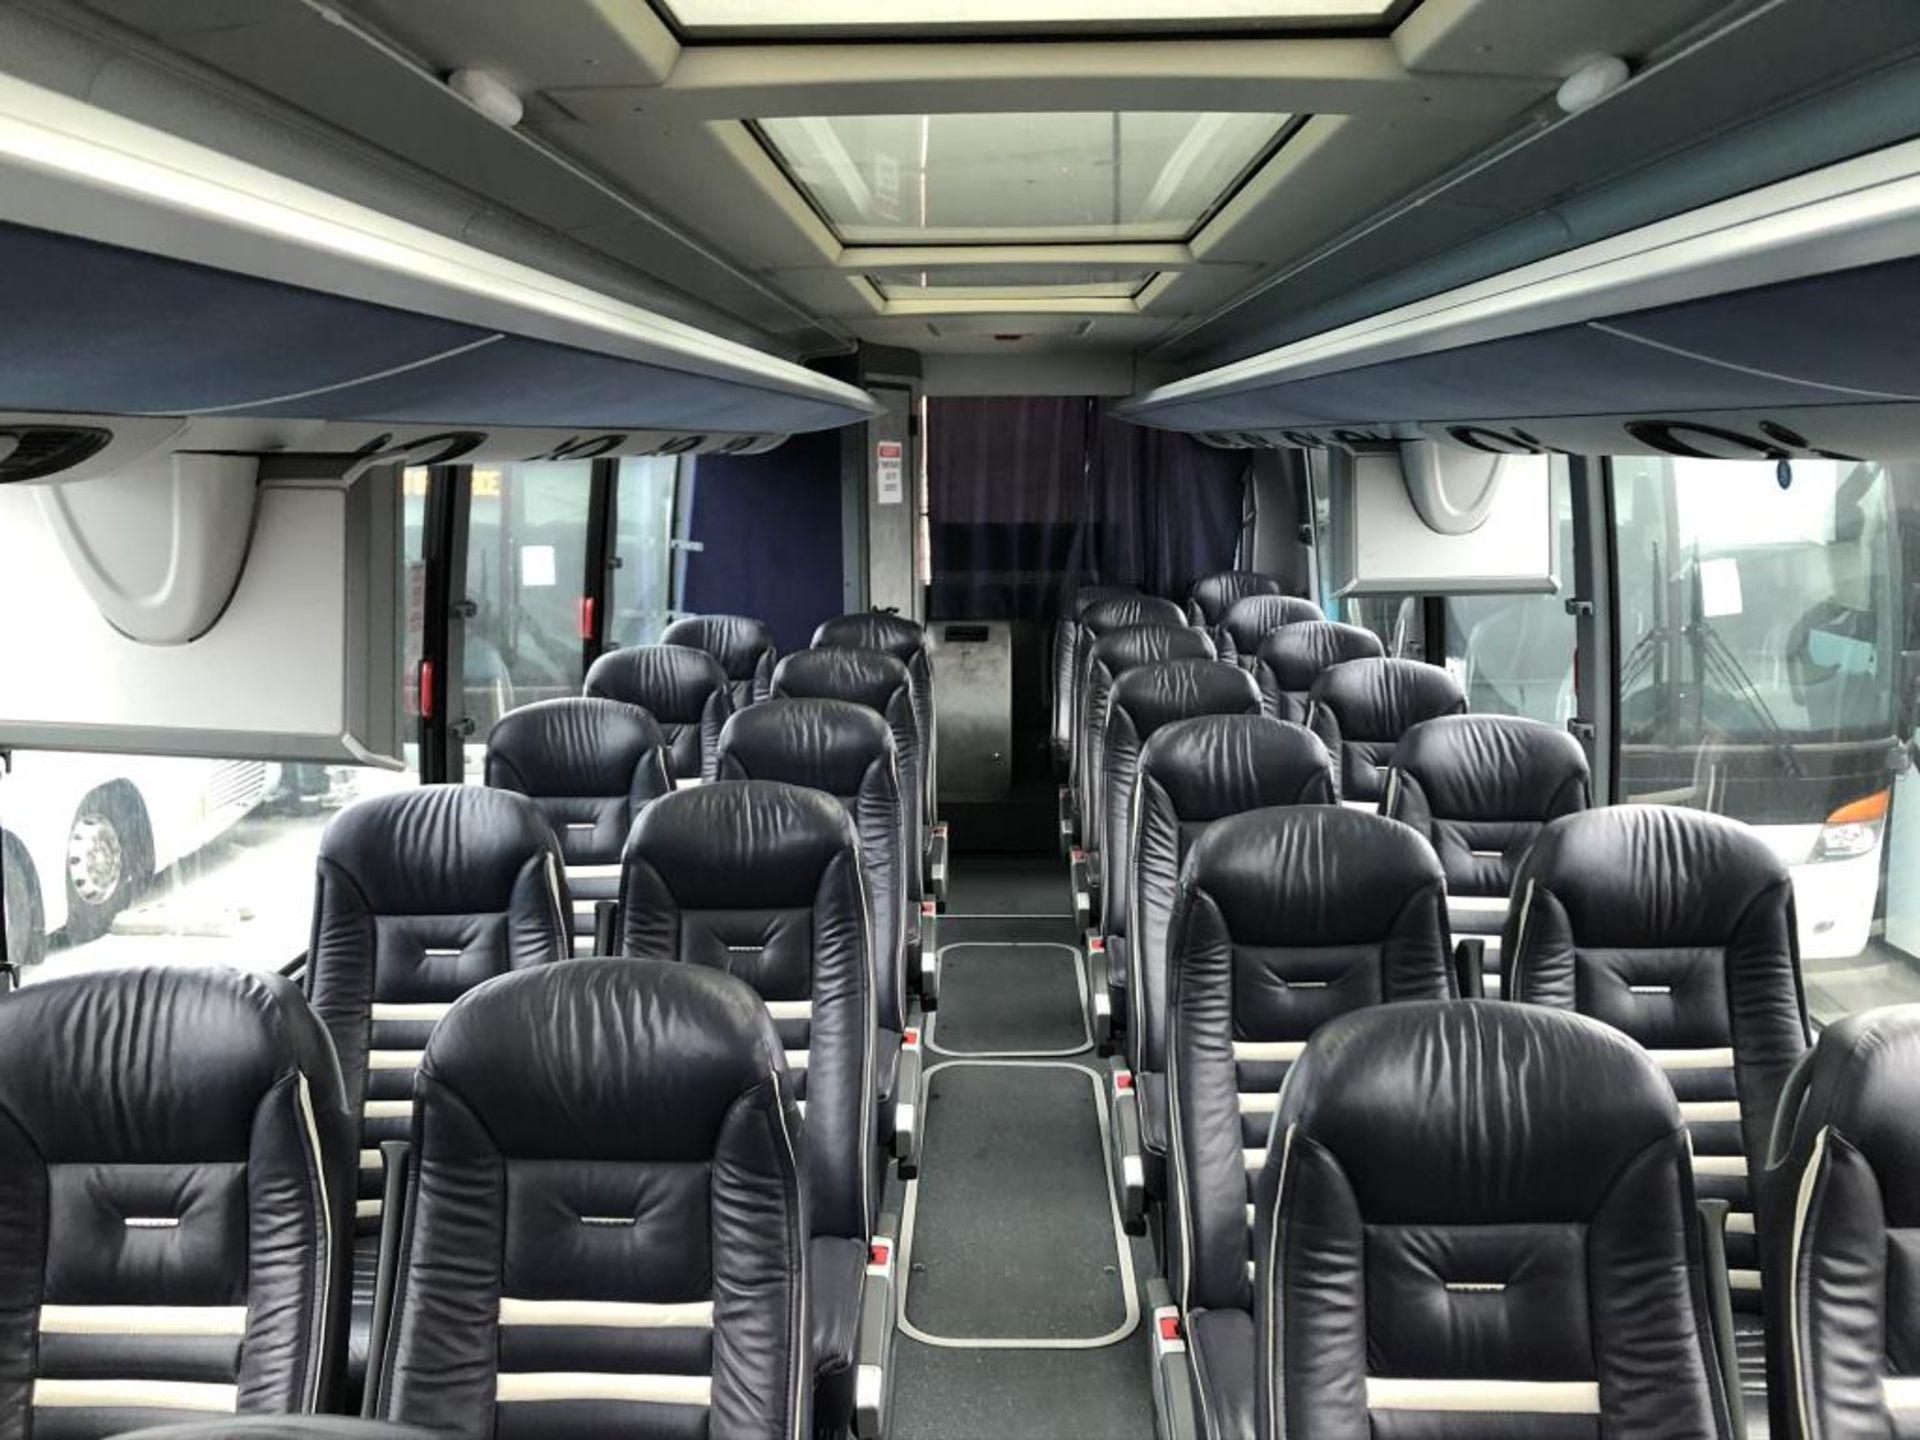 Motor Coach - Image 10 of 18